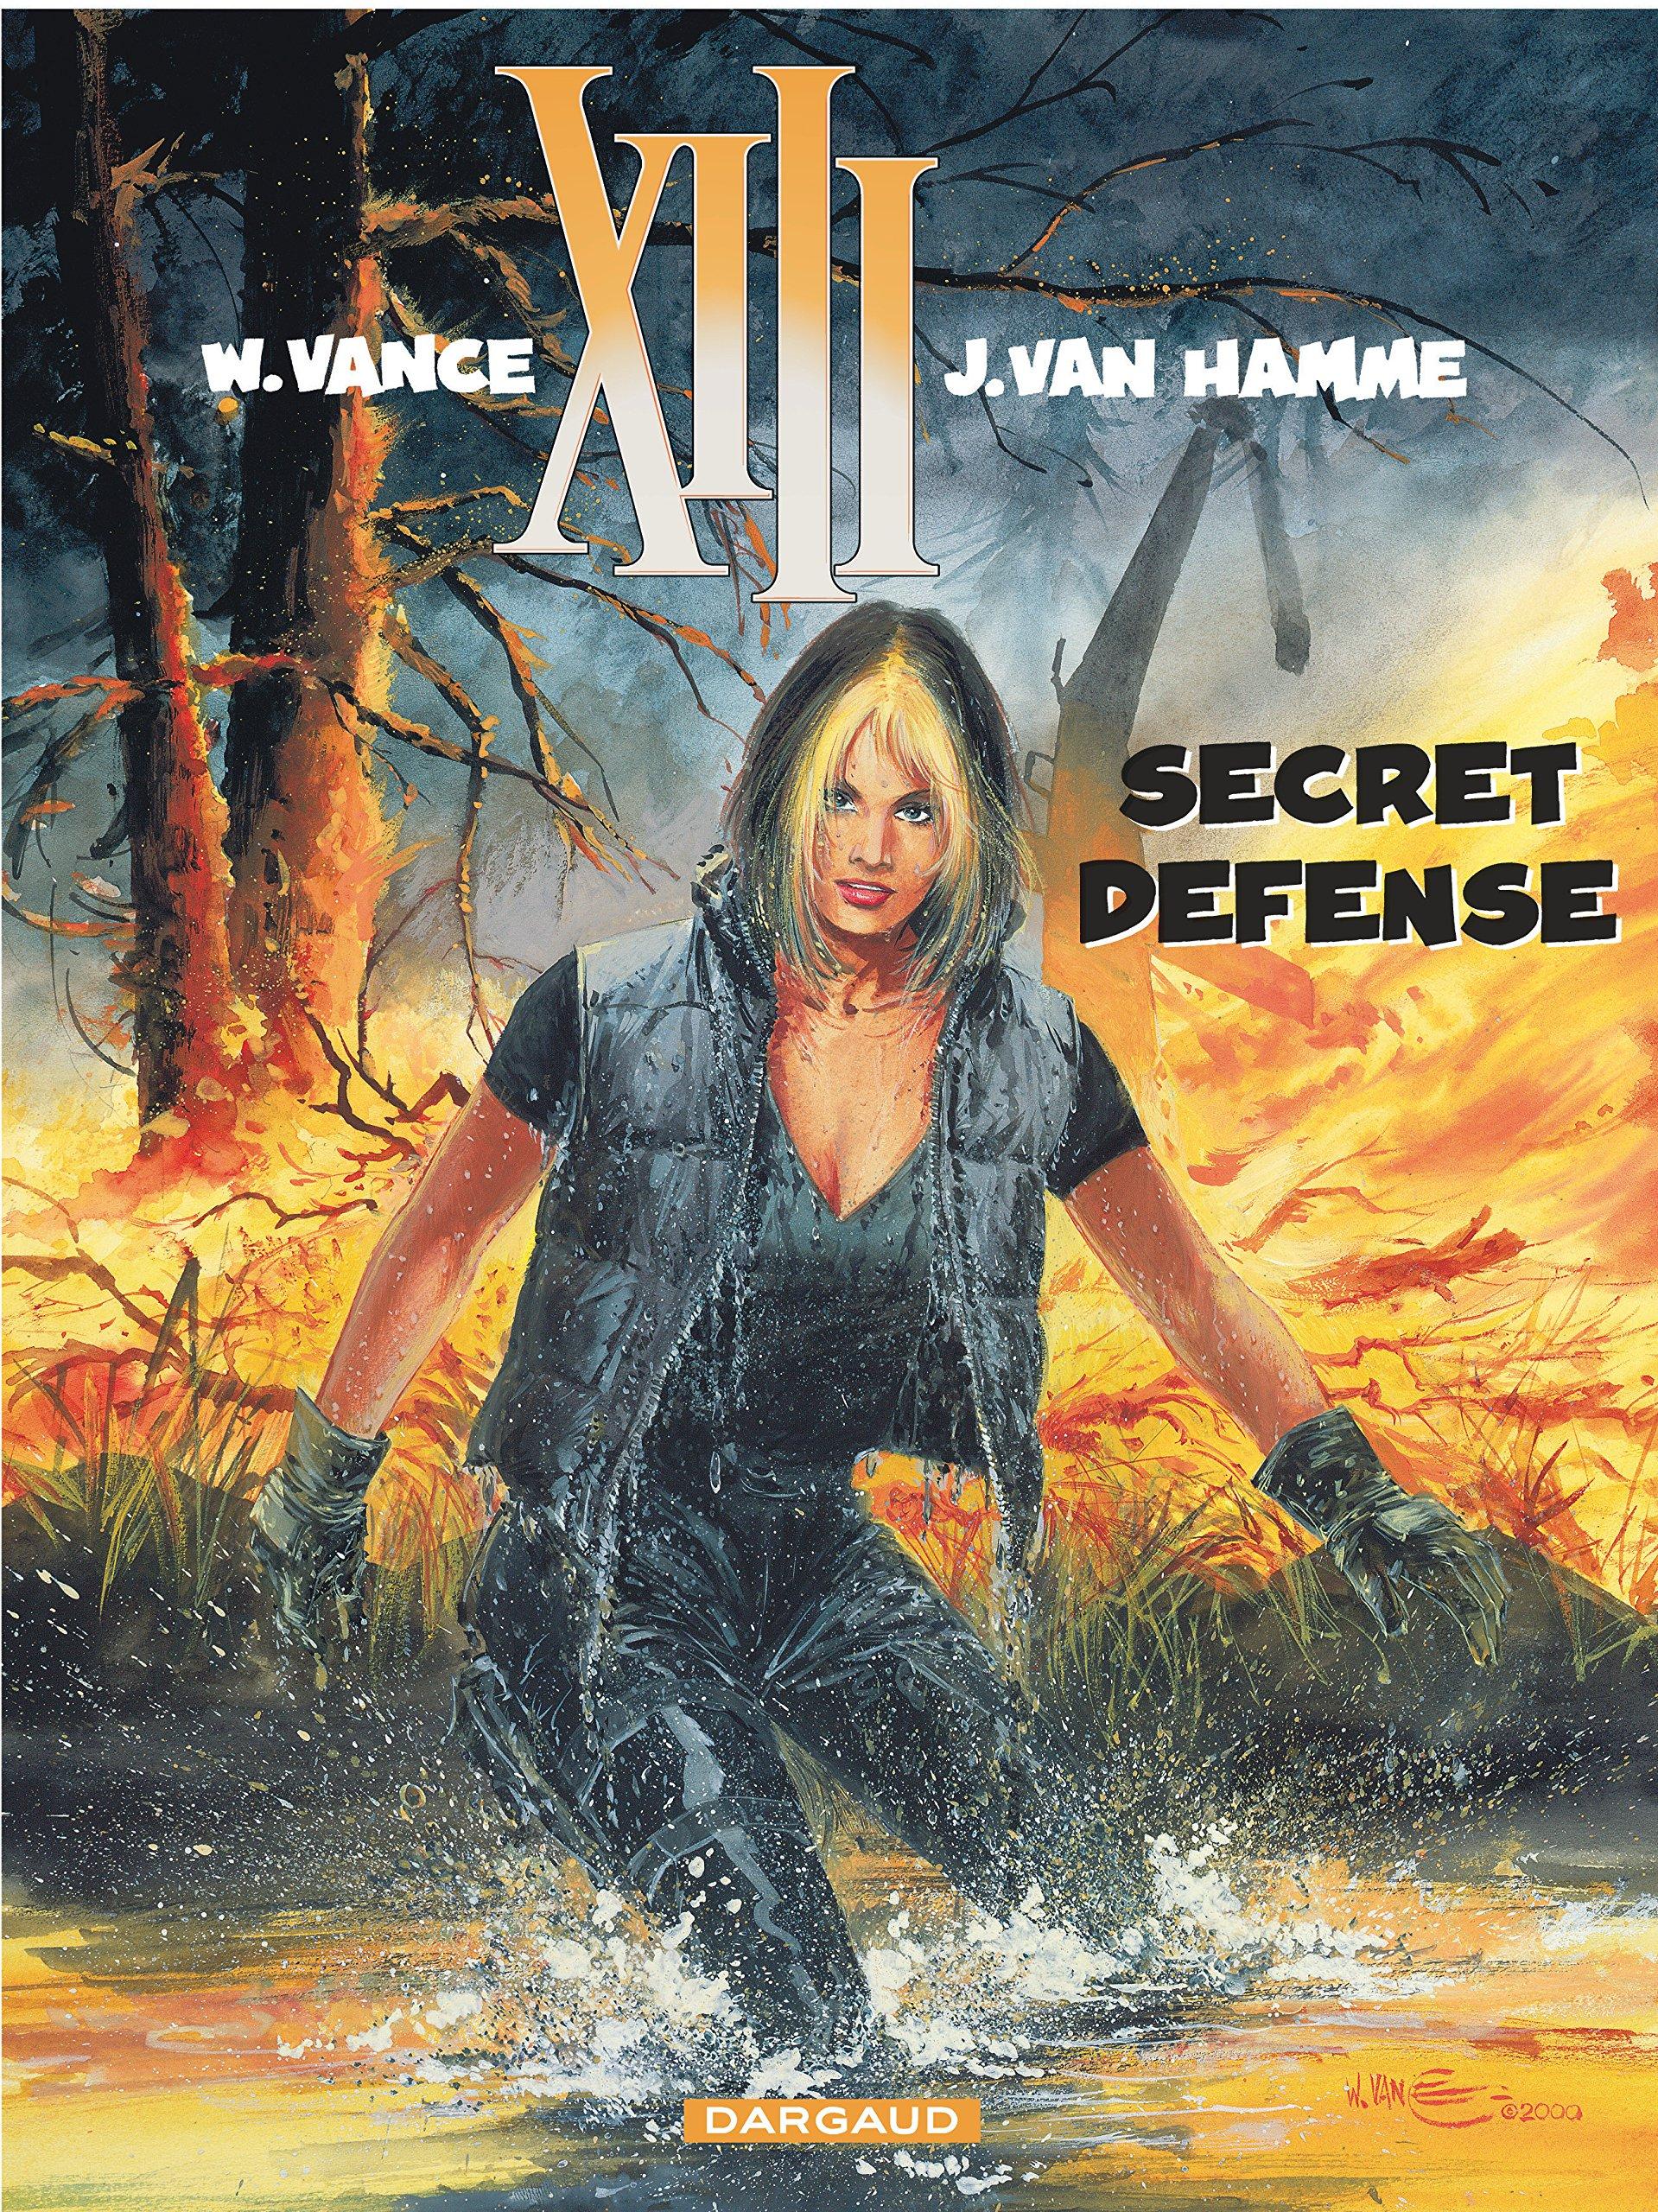 XIII, tome 14 : Secret défense: Jean Van Hamme, William Vance:  9782871292975: Amazon.com: Books